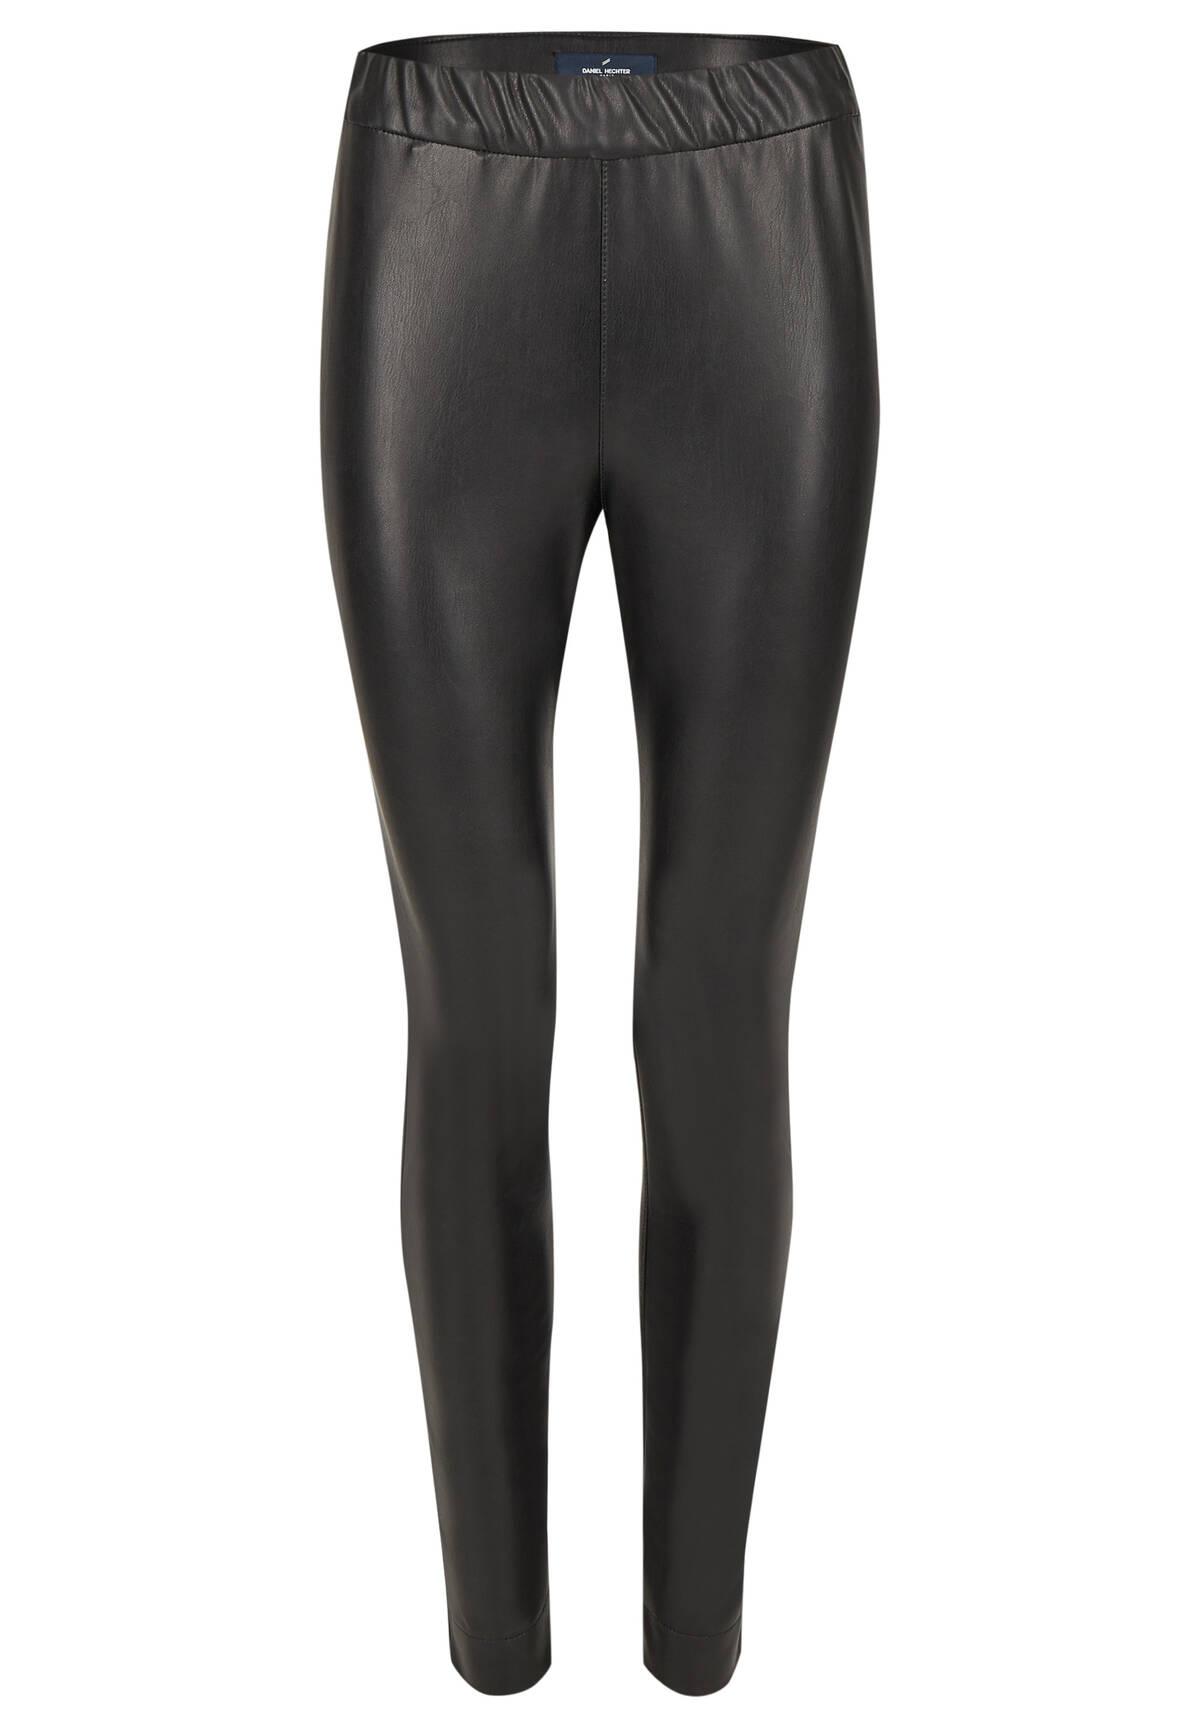 Modische Lederleggins / Fake Leather Pants